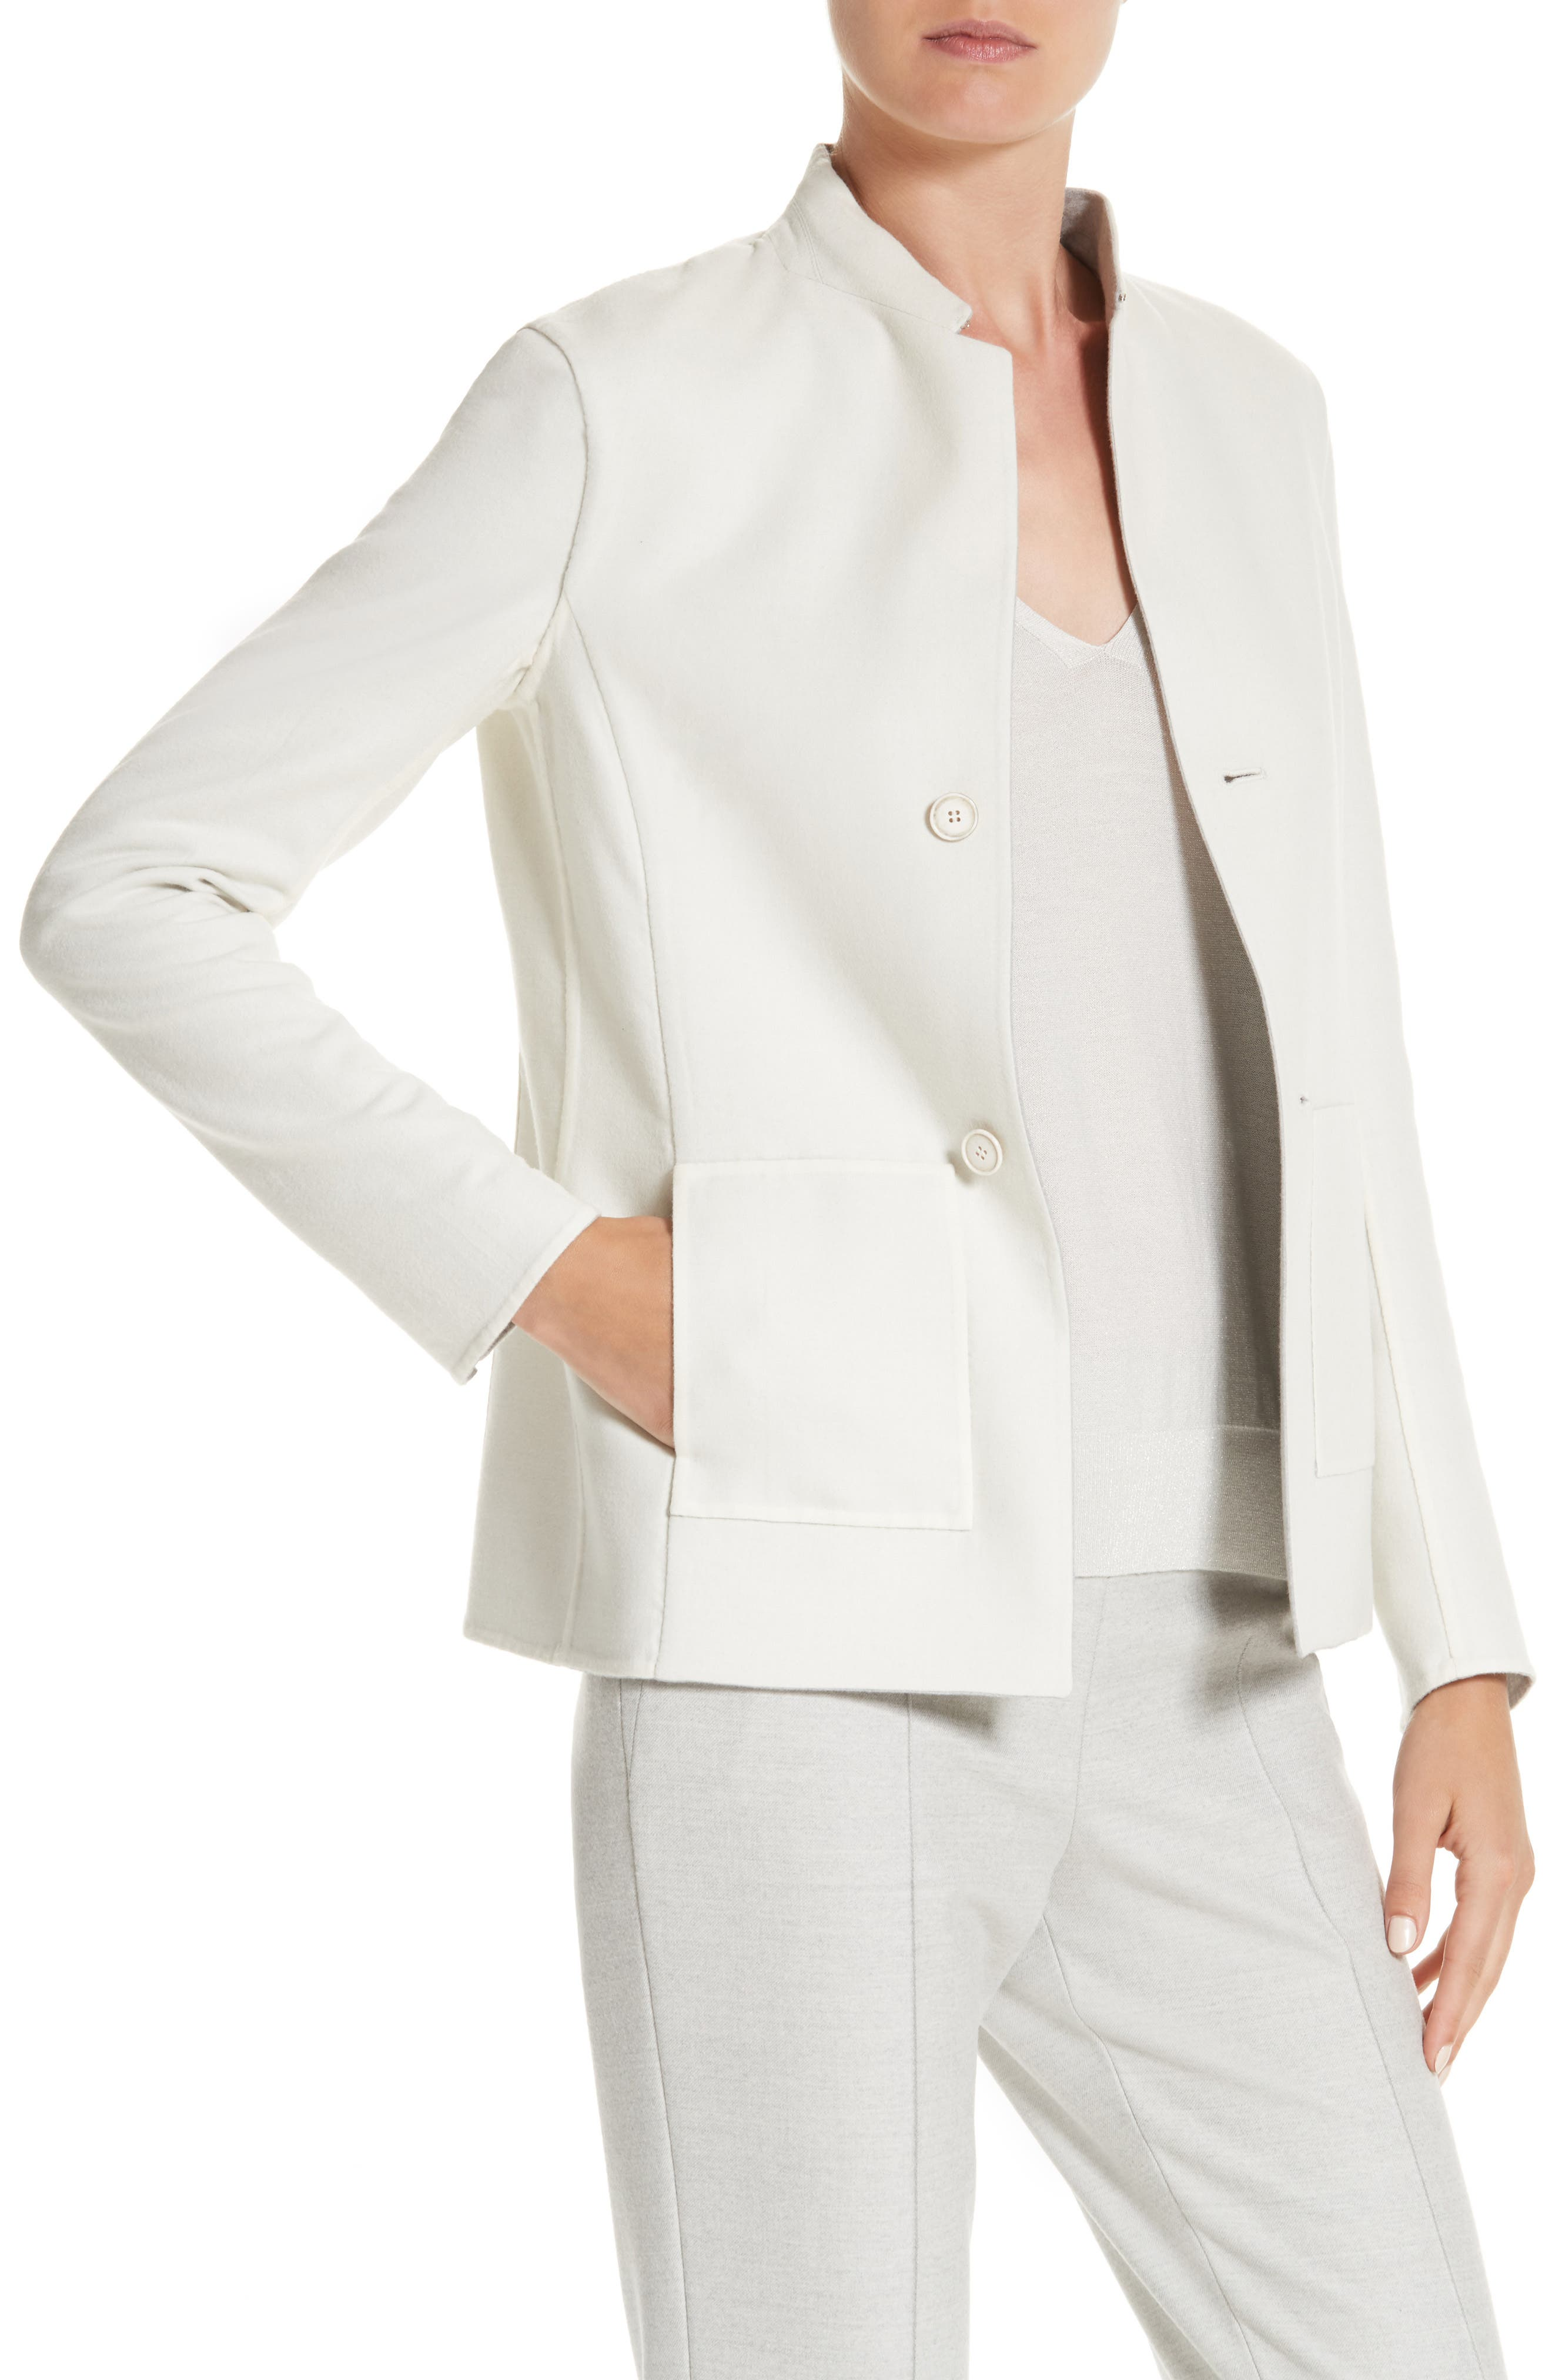 Stretch Wool & Silk Bicolor Reversible Jacket,                             Alternate thumbnail 4, color,                             020